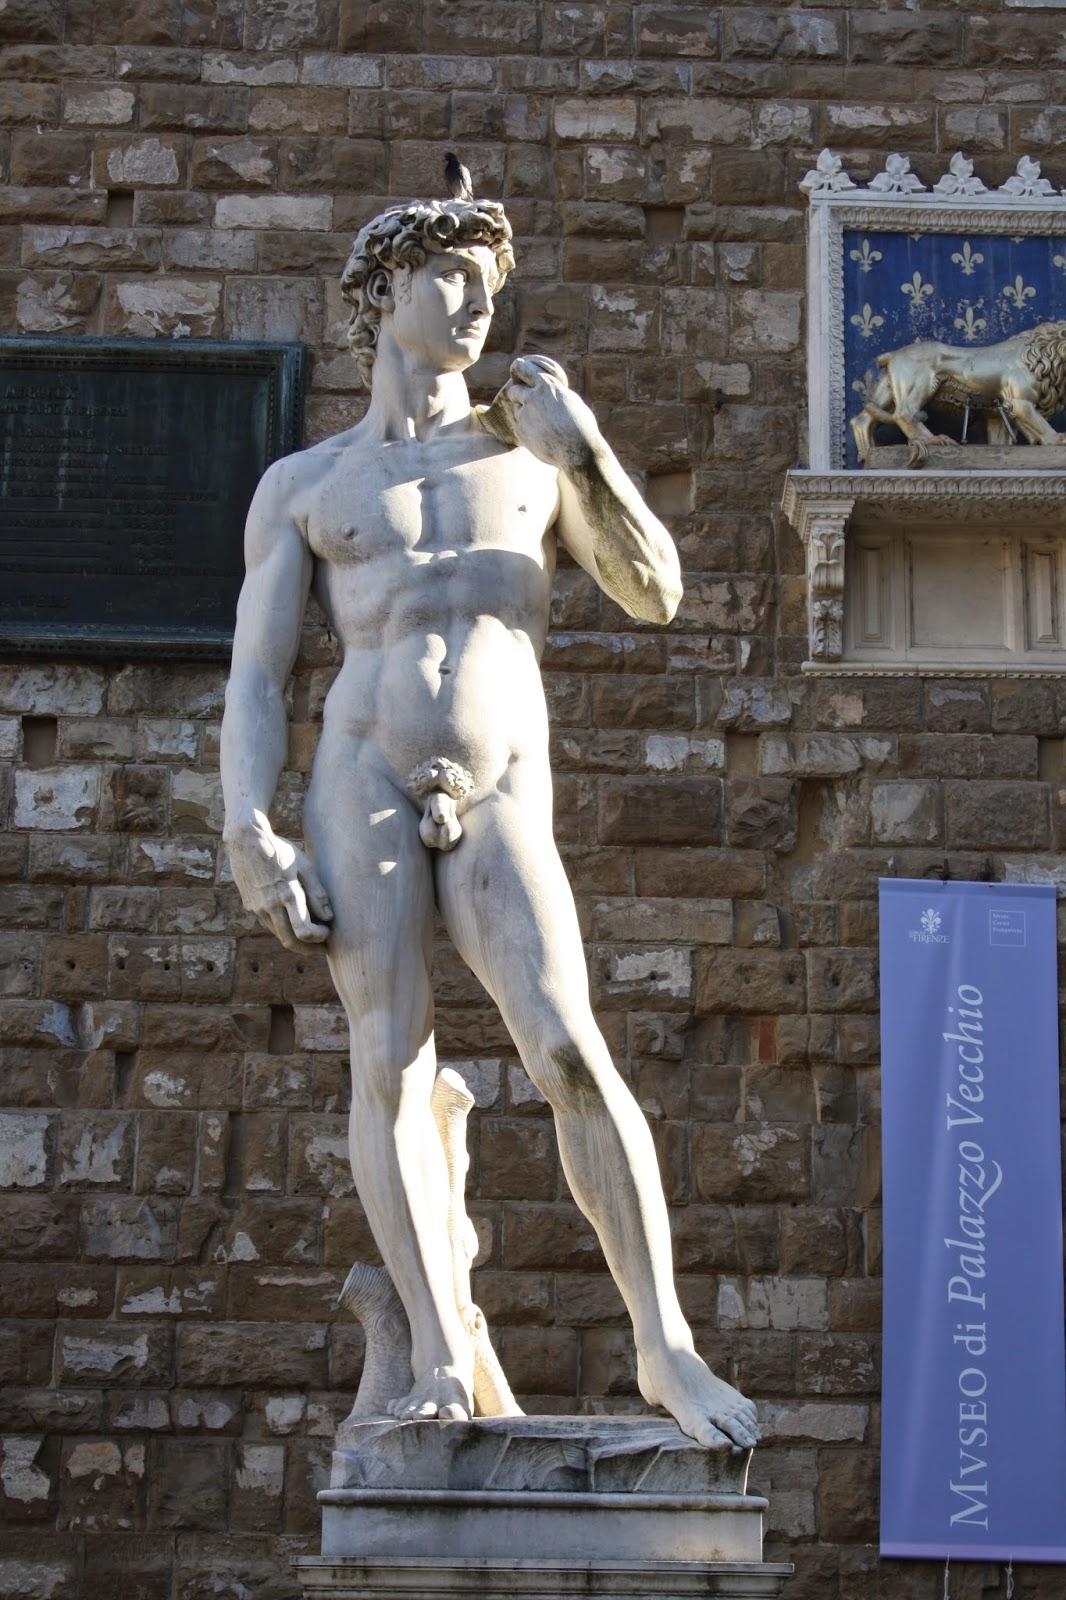 Copia del David situada en la entrada de la Galeria de los Uffizi